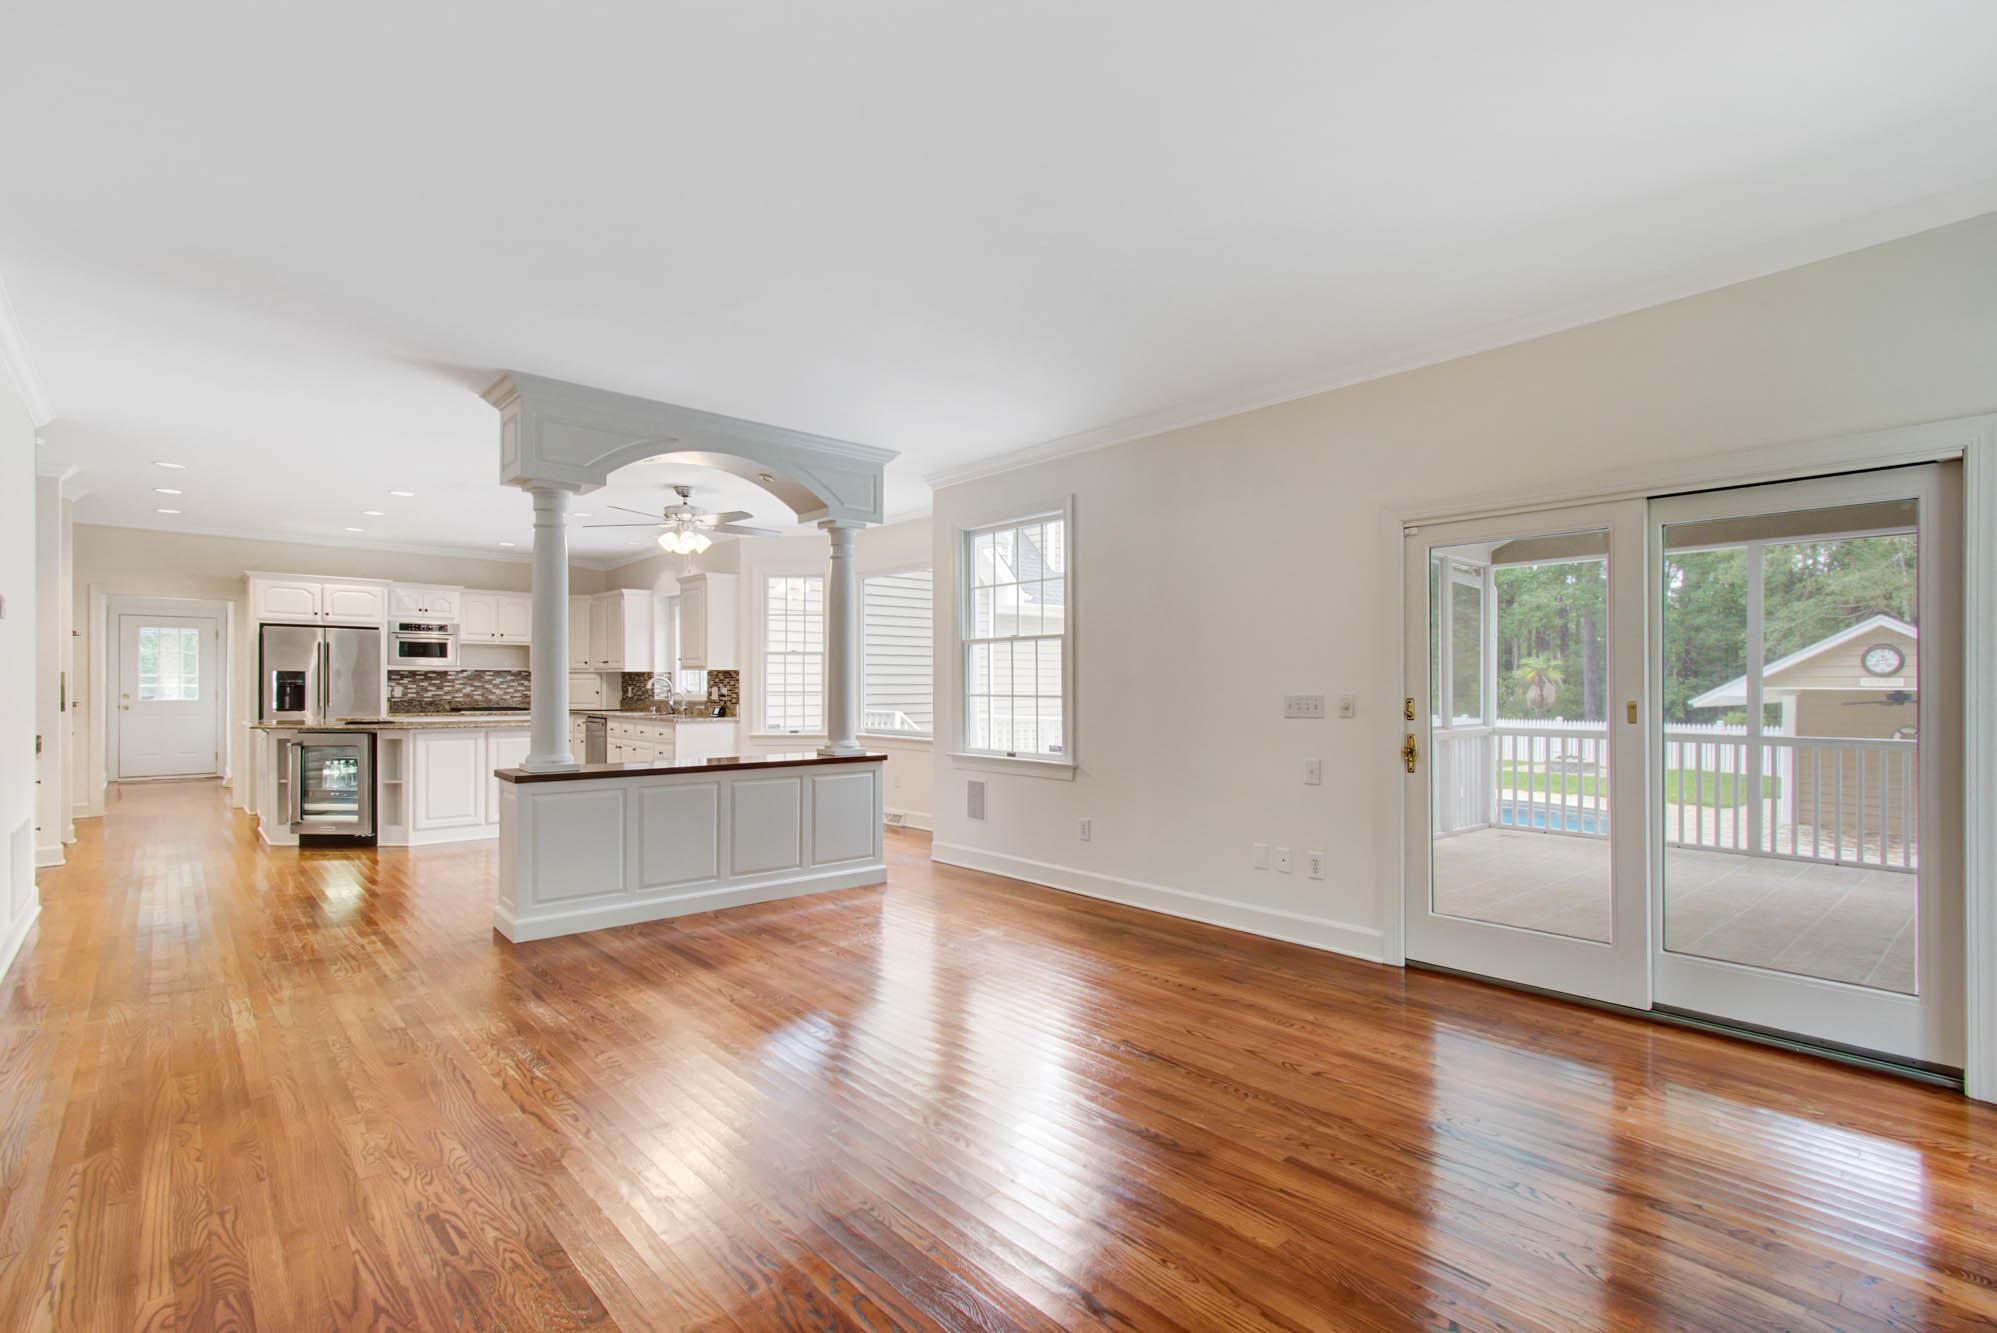 Dunes West Homes For Sale - 3515 Colonel Vanderhorst, Mount Pleasant, SC - 50